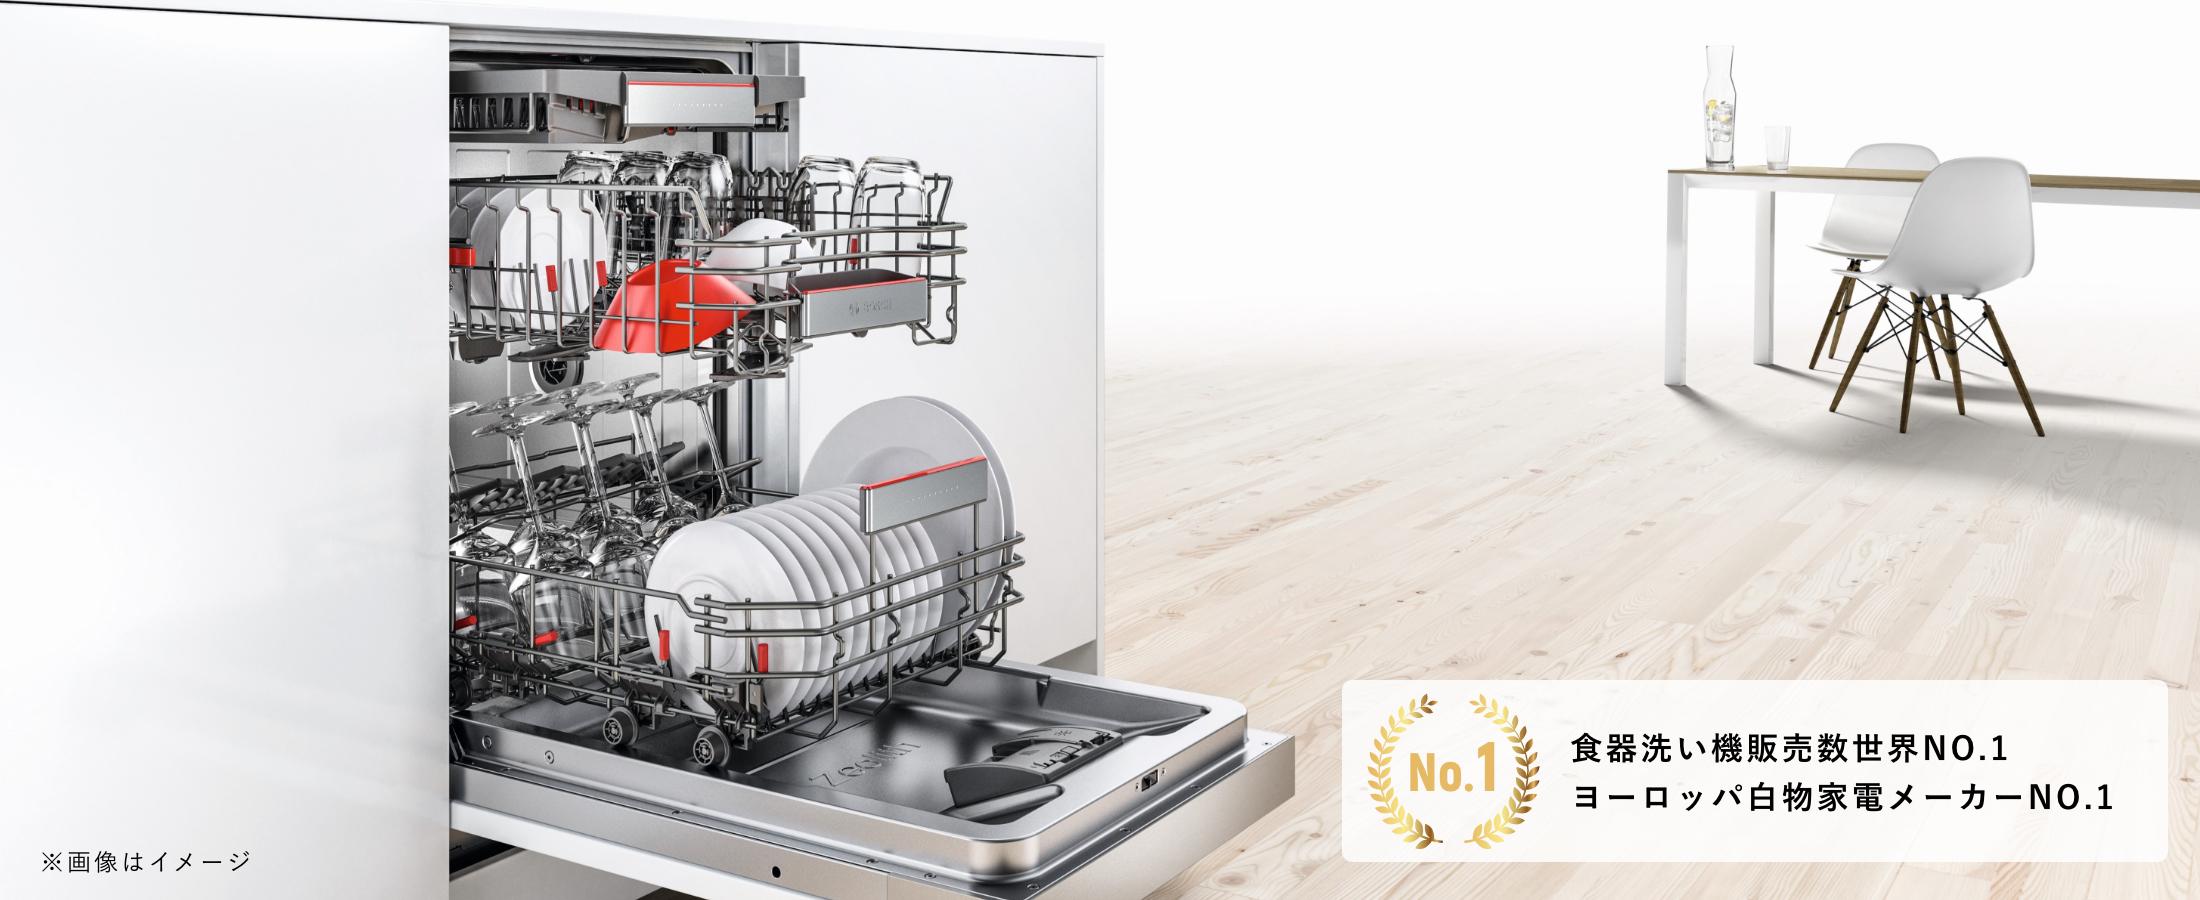 BOSCH 食器洗い機販売数世界NO.1 ヨーロッパ白物家電メーカーNO.1